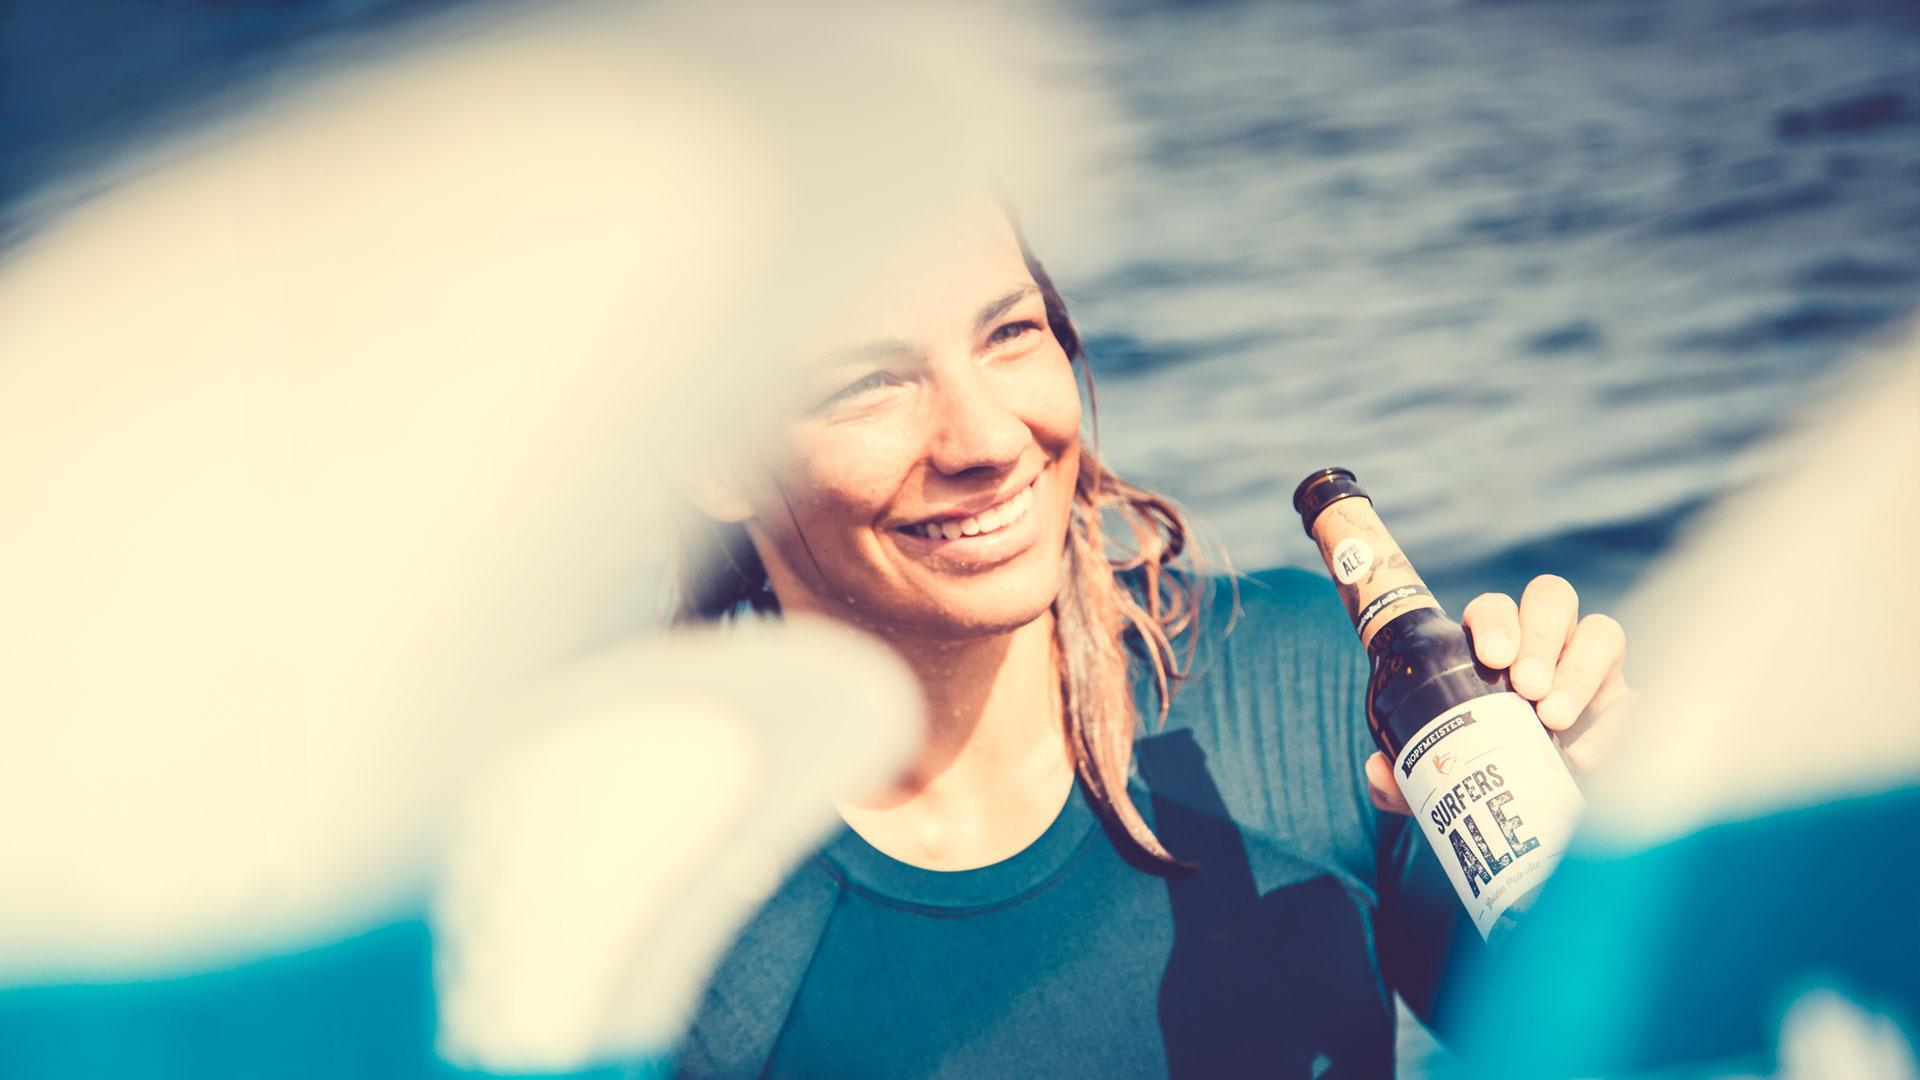 Hopfmeister Surfersale Bier